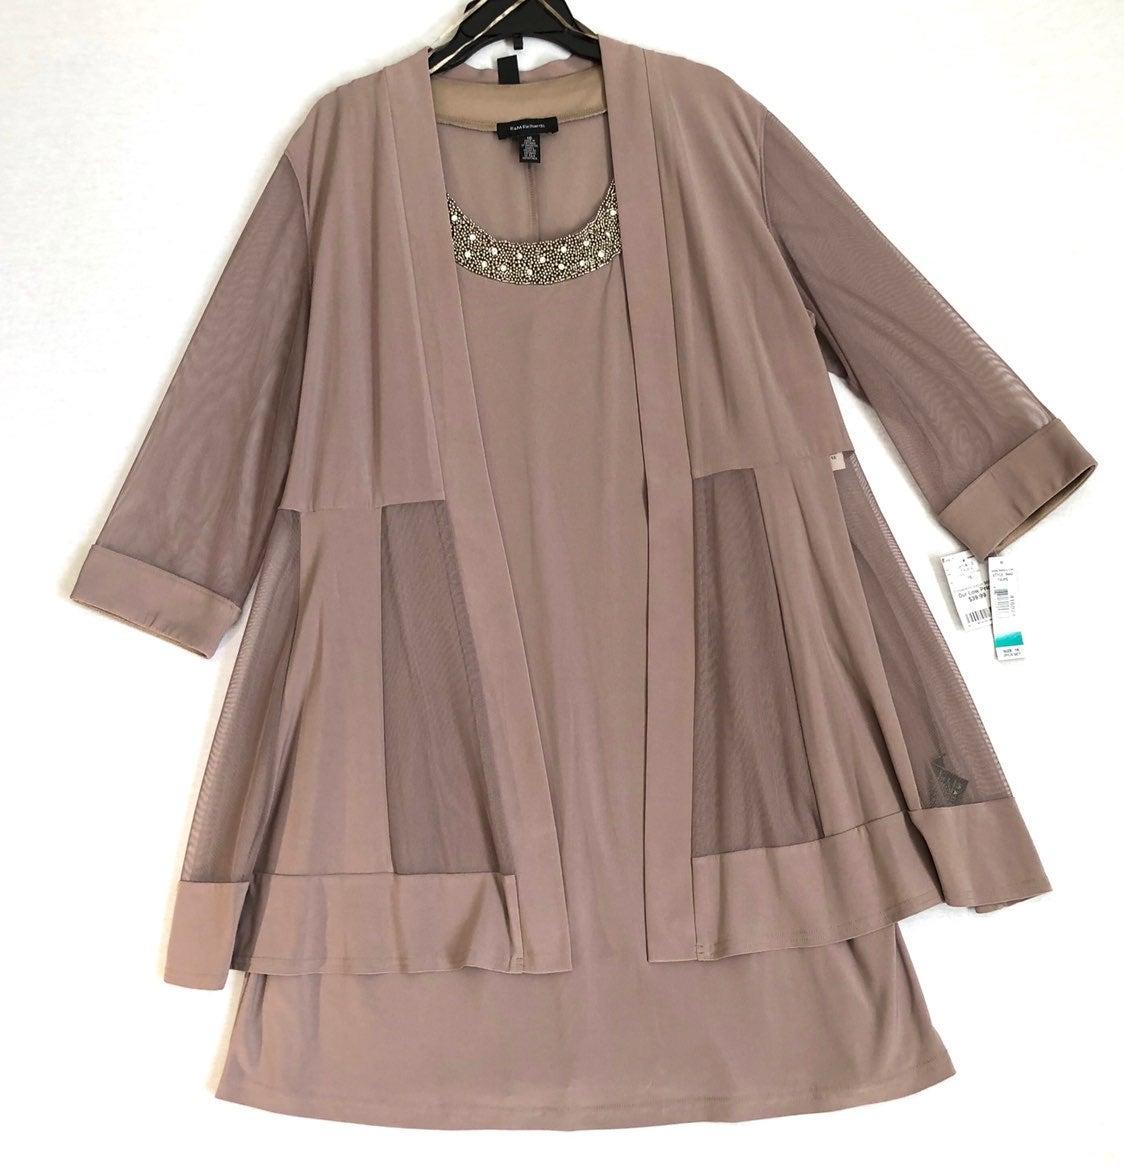 R & M Richards 2-pc. Dress Set 16W